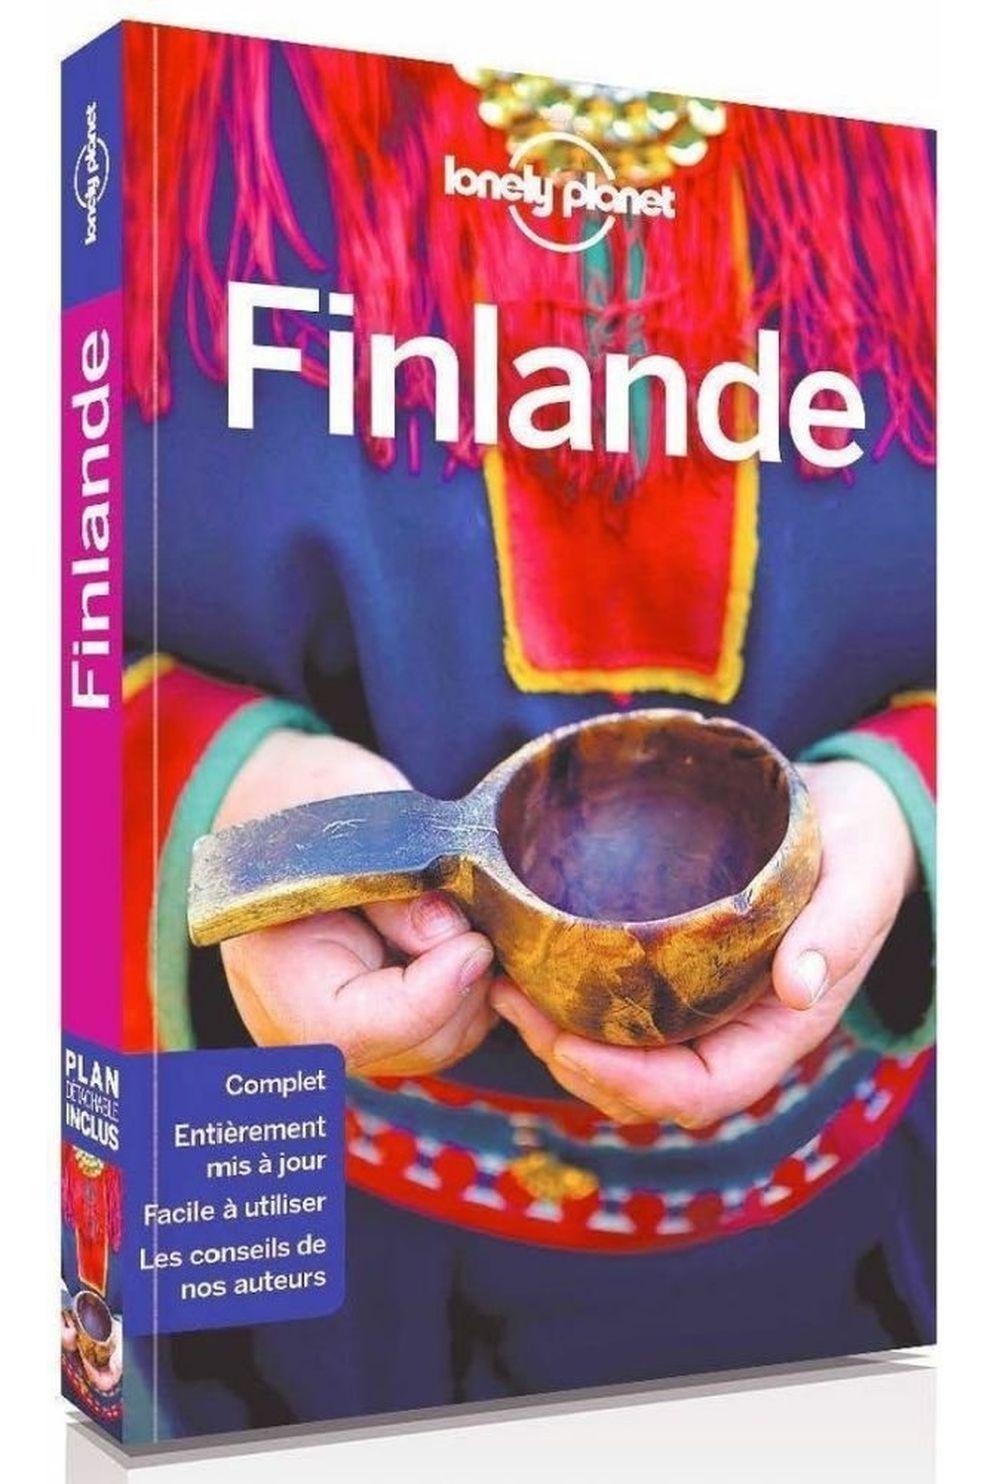 Lonely Planet Boek Lp Lpf.157 - 2018